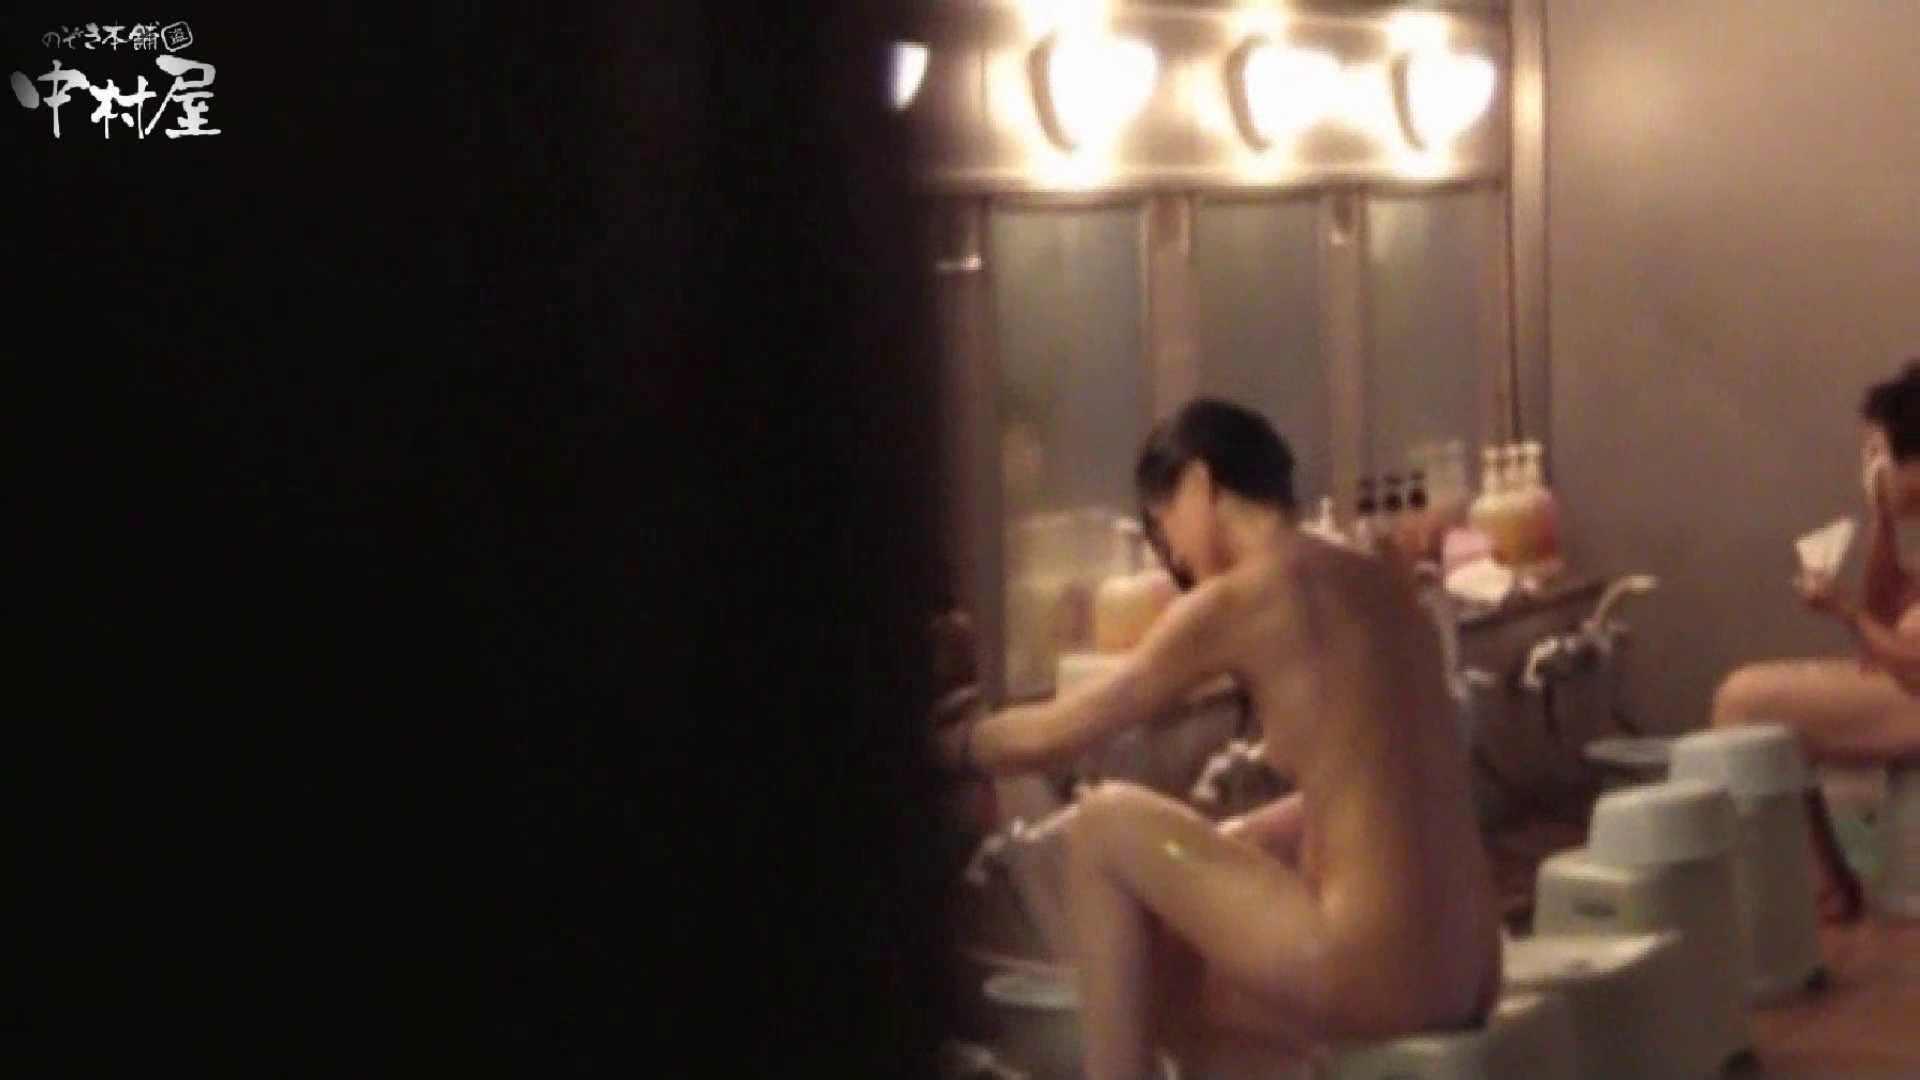 民家風呂専門盗撮師の超危険映像 vol.009 盗撮シリーズ セックス無修正動画無料 90PIX 57